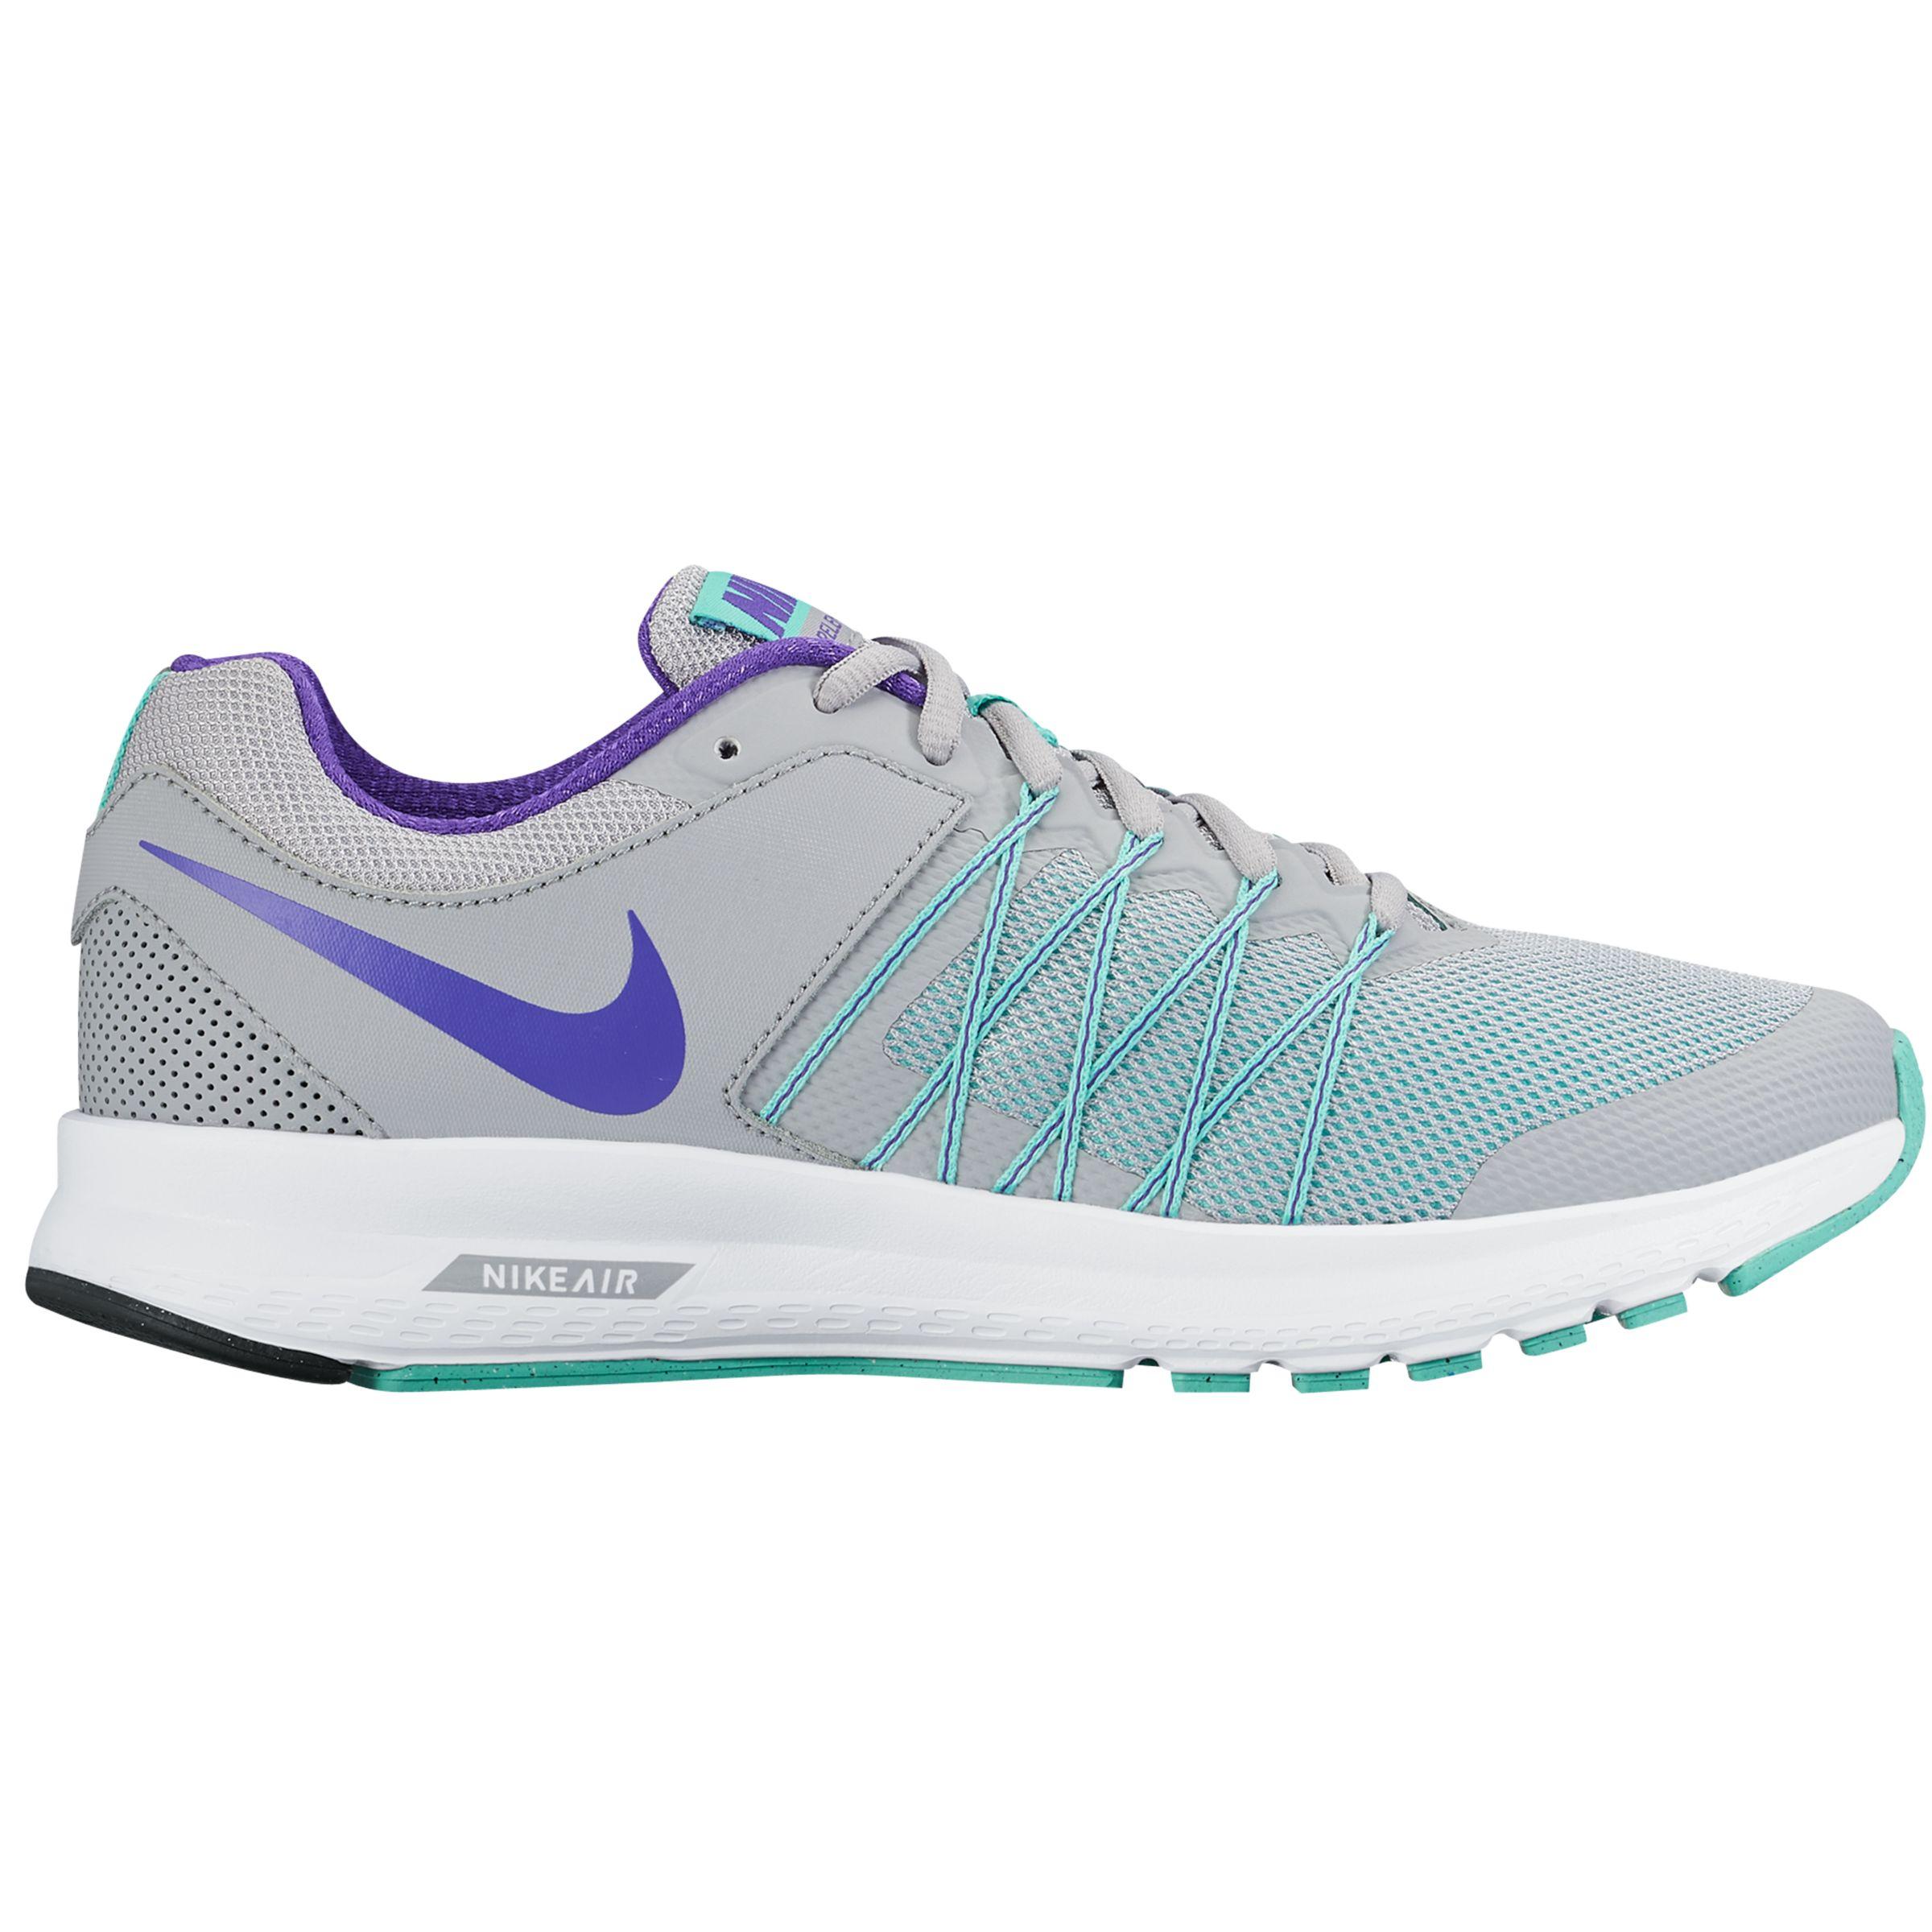 timeless design 6cf5d be530 Nike Air Relentless 6 Women's Running Shoes at John Lewis ...